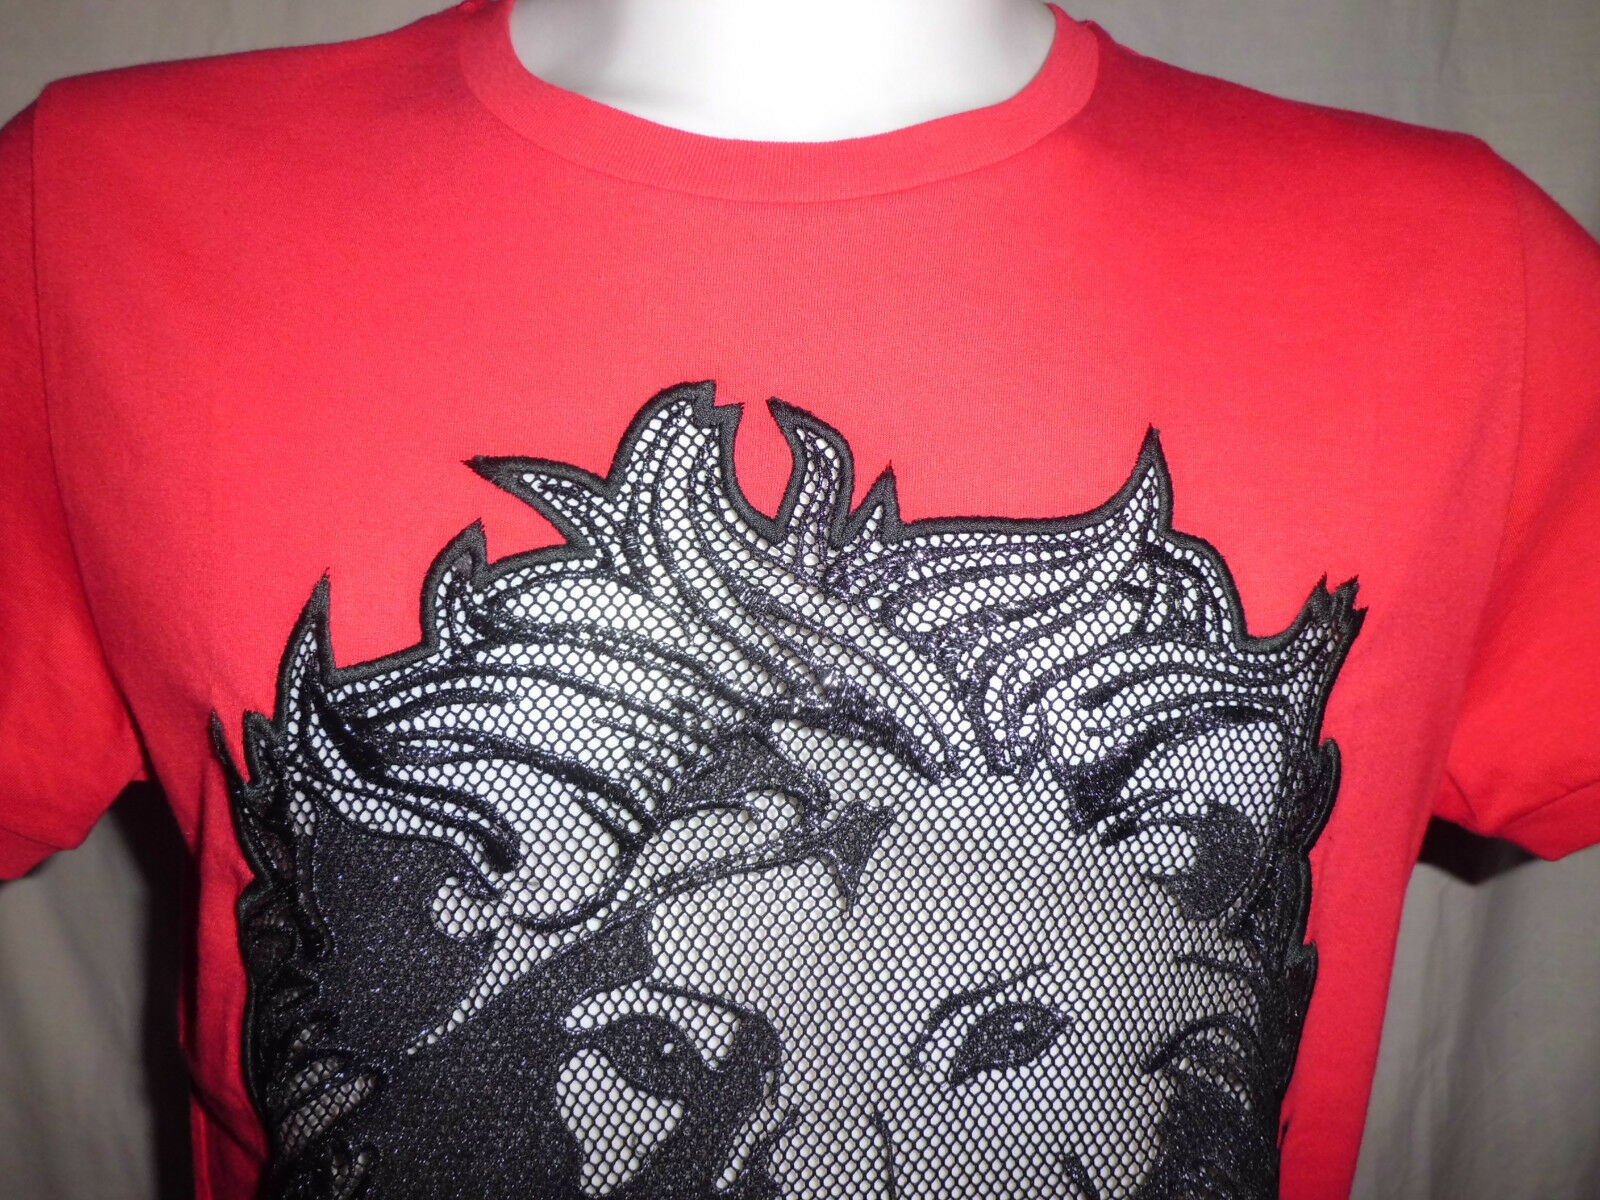 Versace Versus Versus Versus  T- Shirt  Uomo Uomo Cotone Lion rosso  Dimensione  L dbbe8e